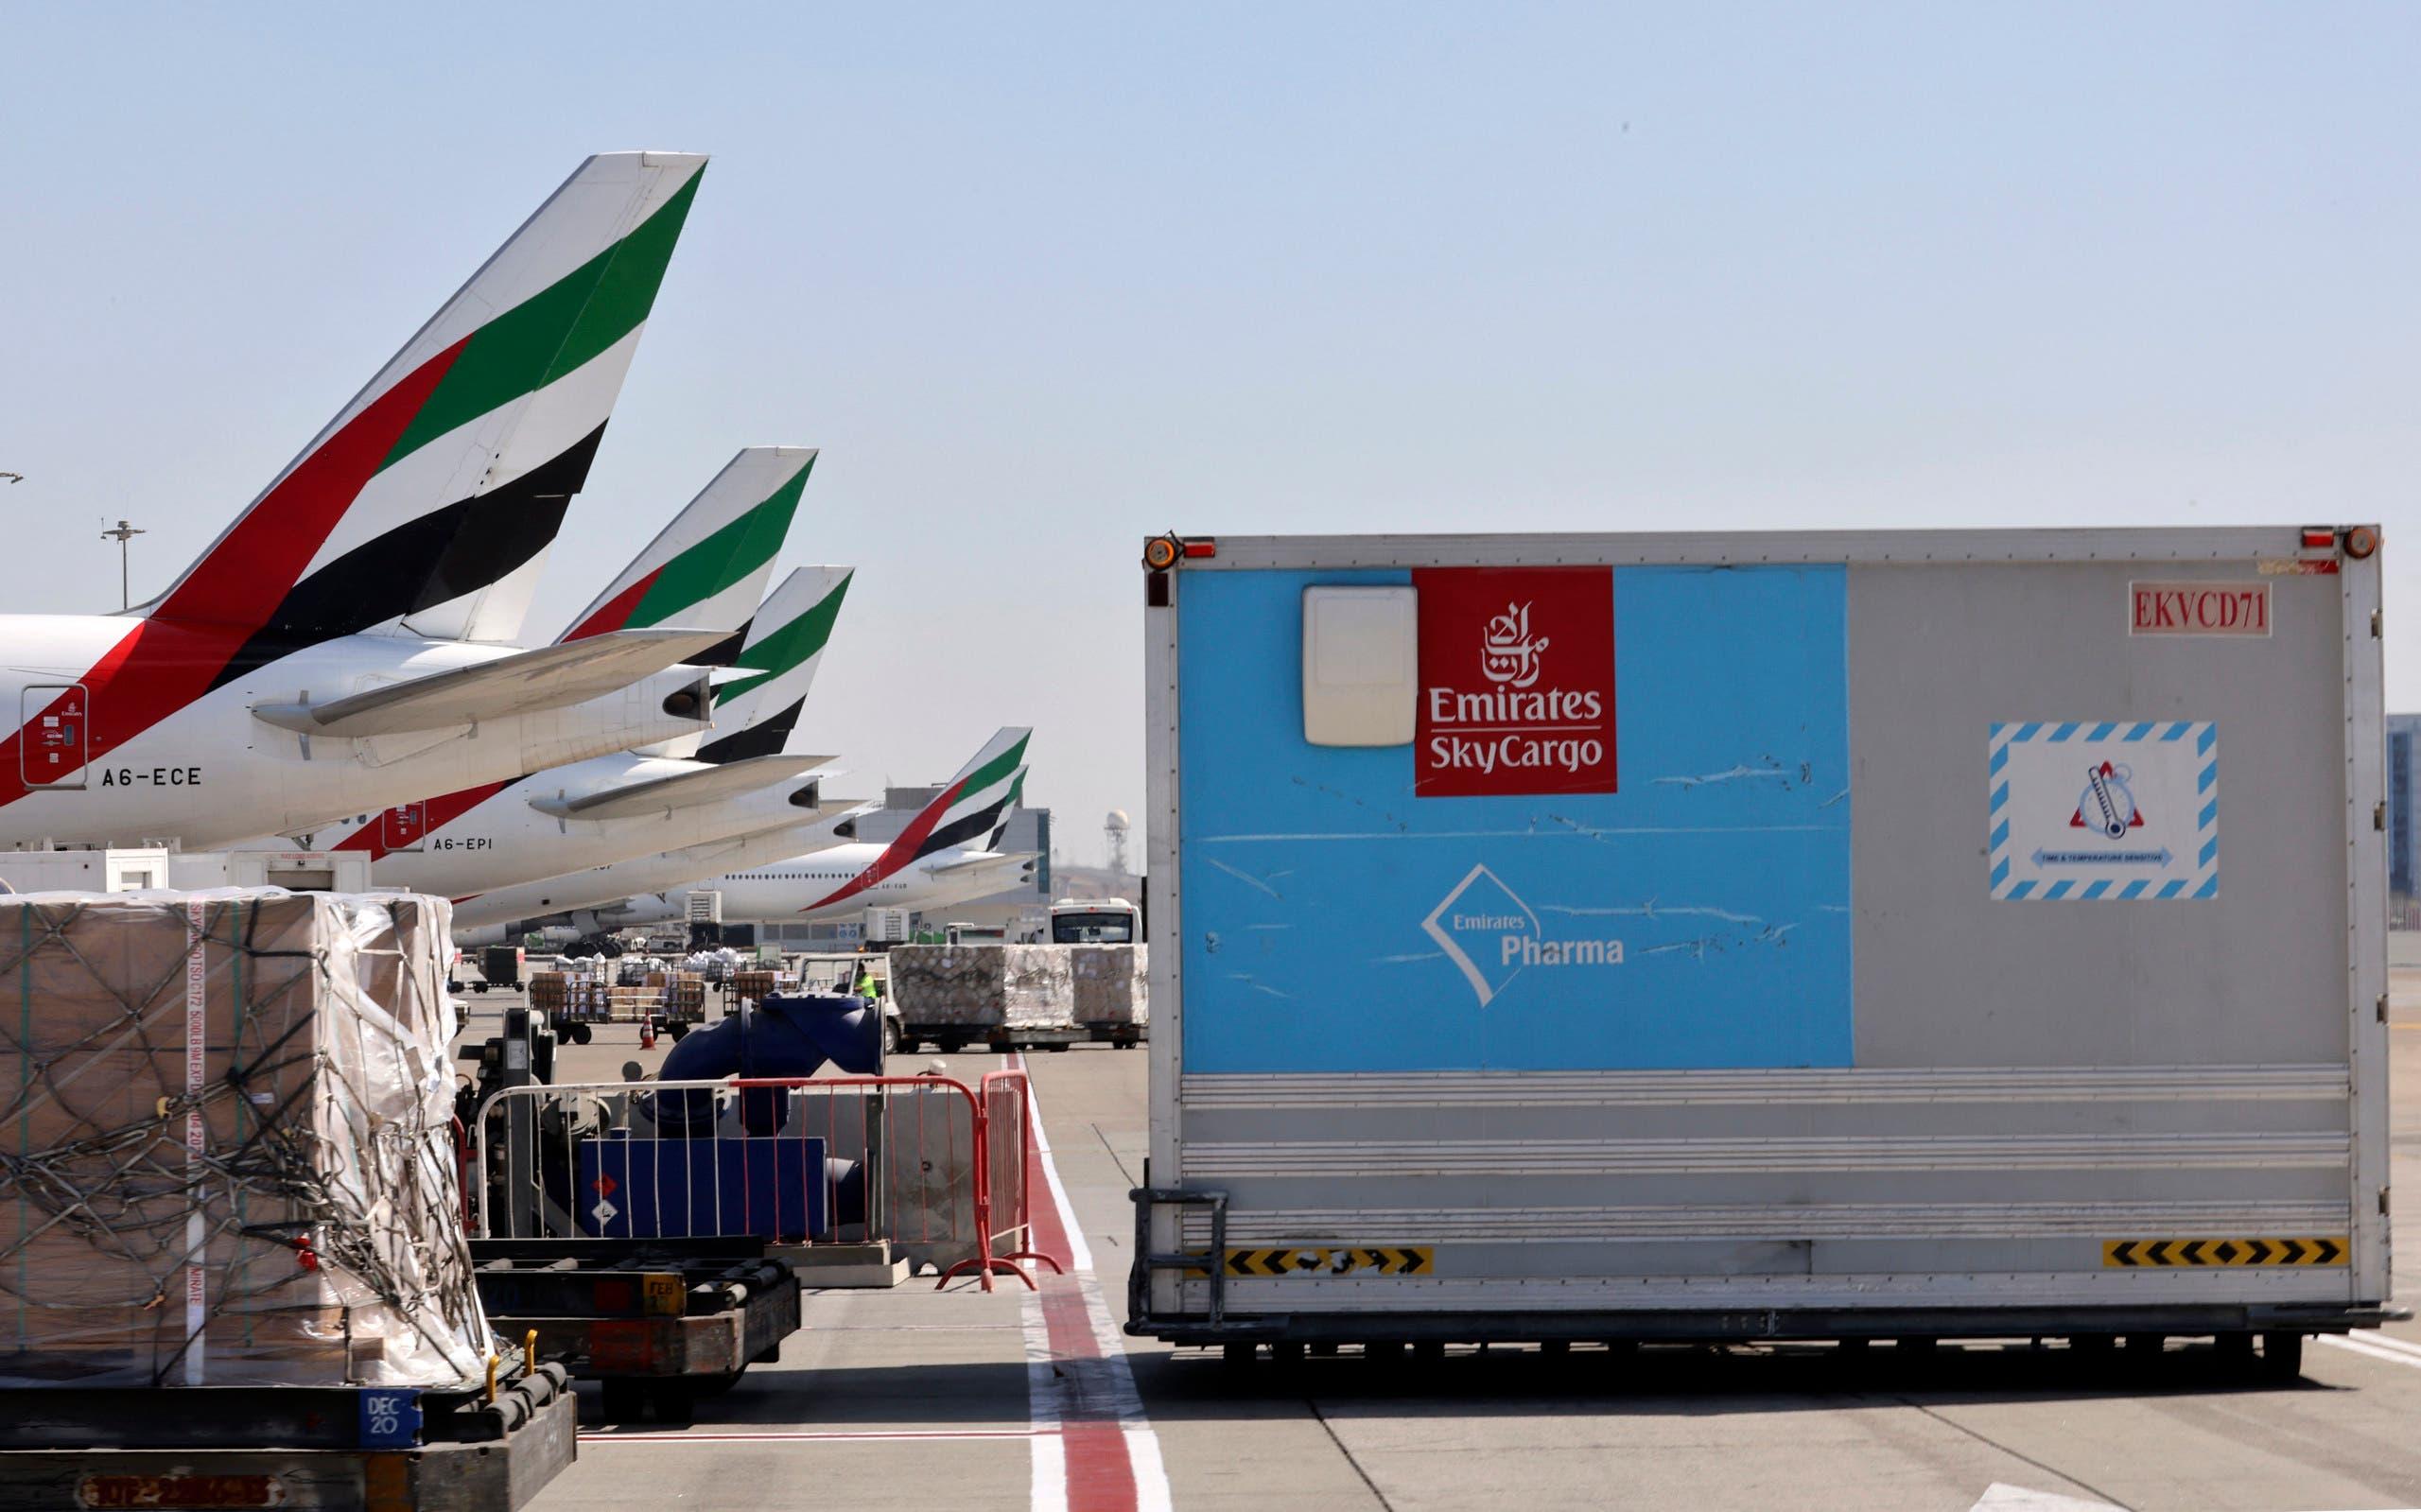 An Emirates Airlines Boing 777 plane unload a coronavirus vaccine shipment at Dubai International Airport on February 1, 2021. (File photo: AFP)